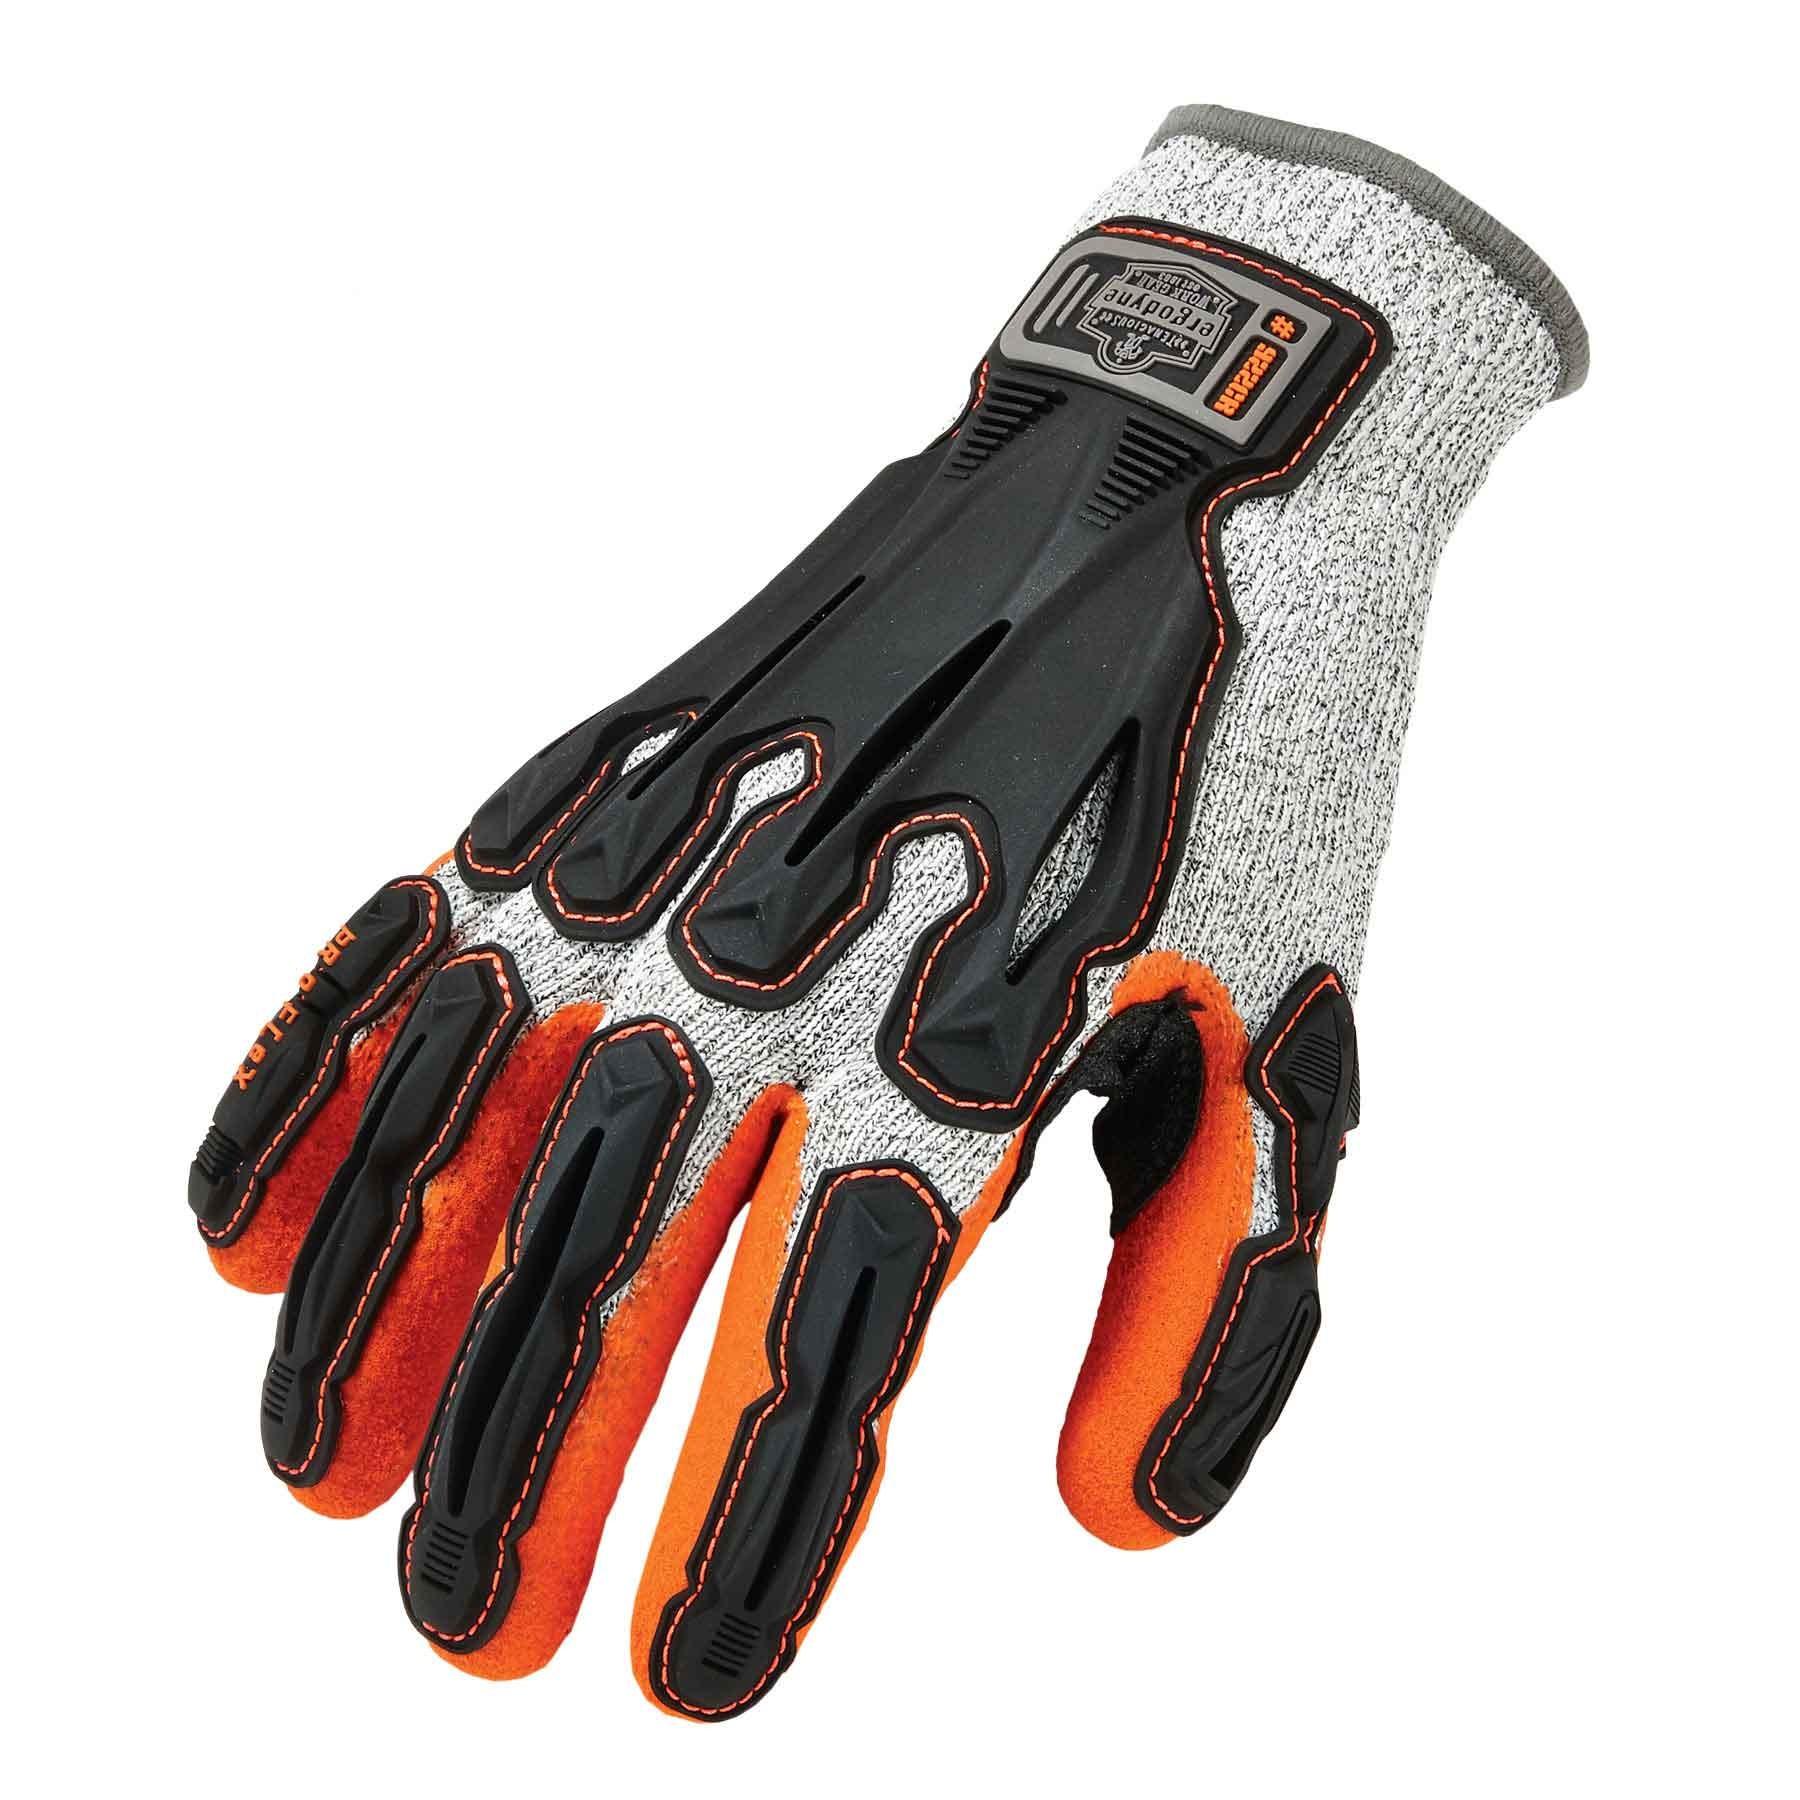 ANSI Level A4 Cut Resistant Work Gloves (Medium Cut Hazards)